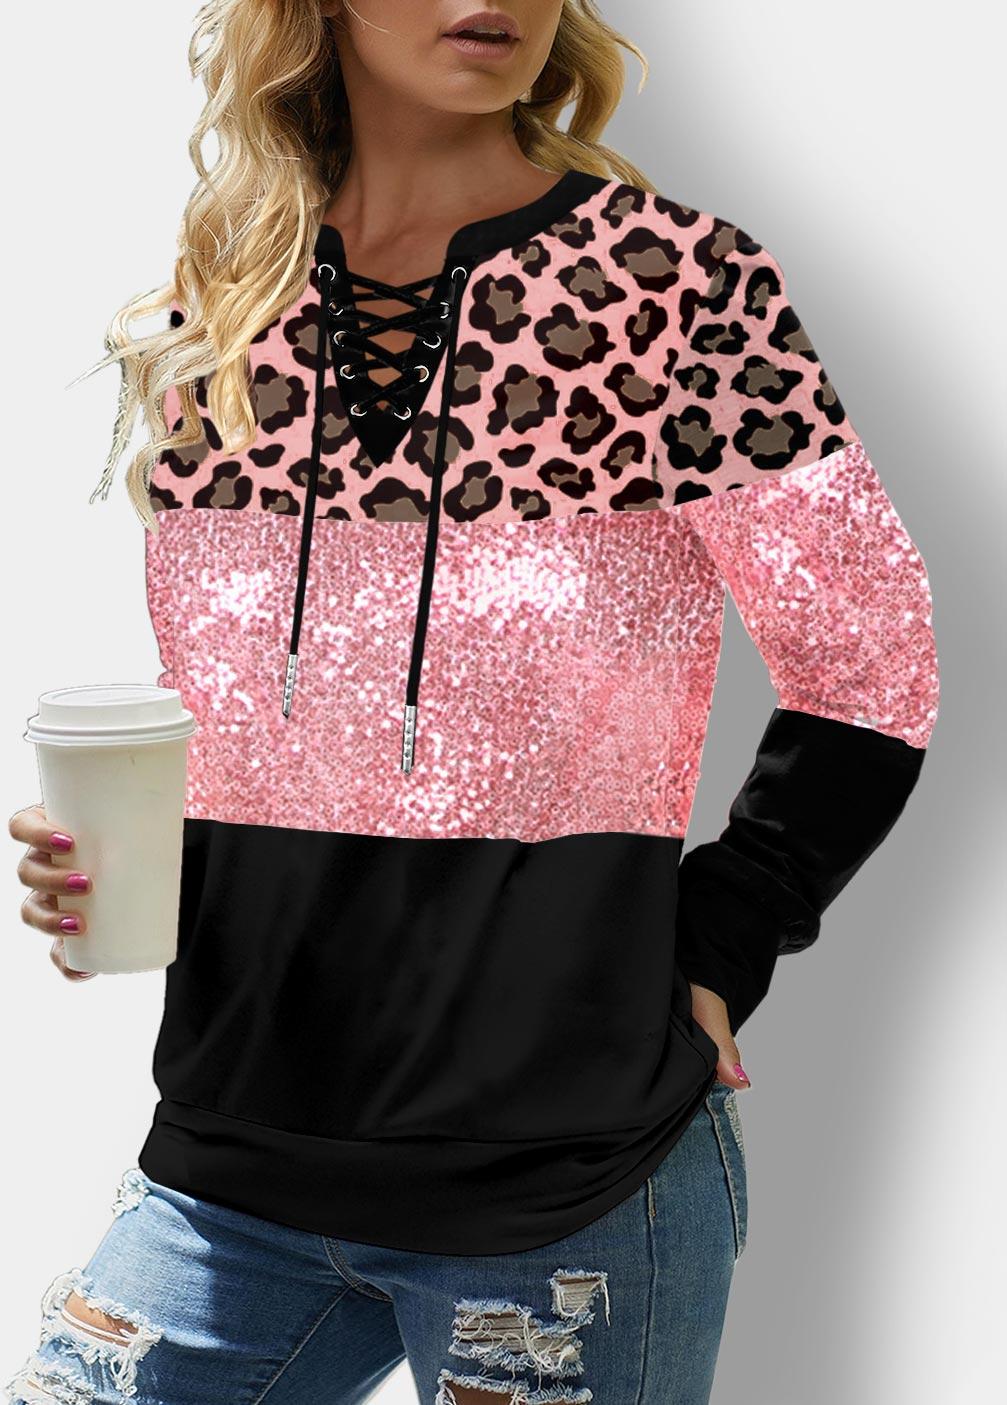 Lace Up Leopard Sequin Panel Sweatshirt